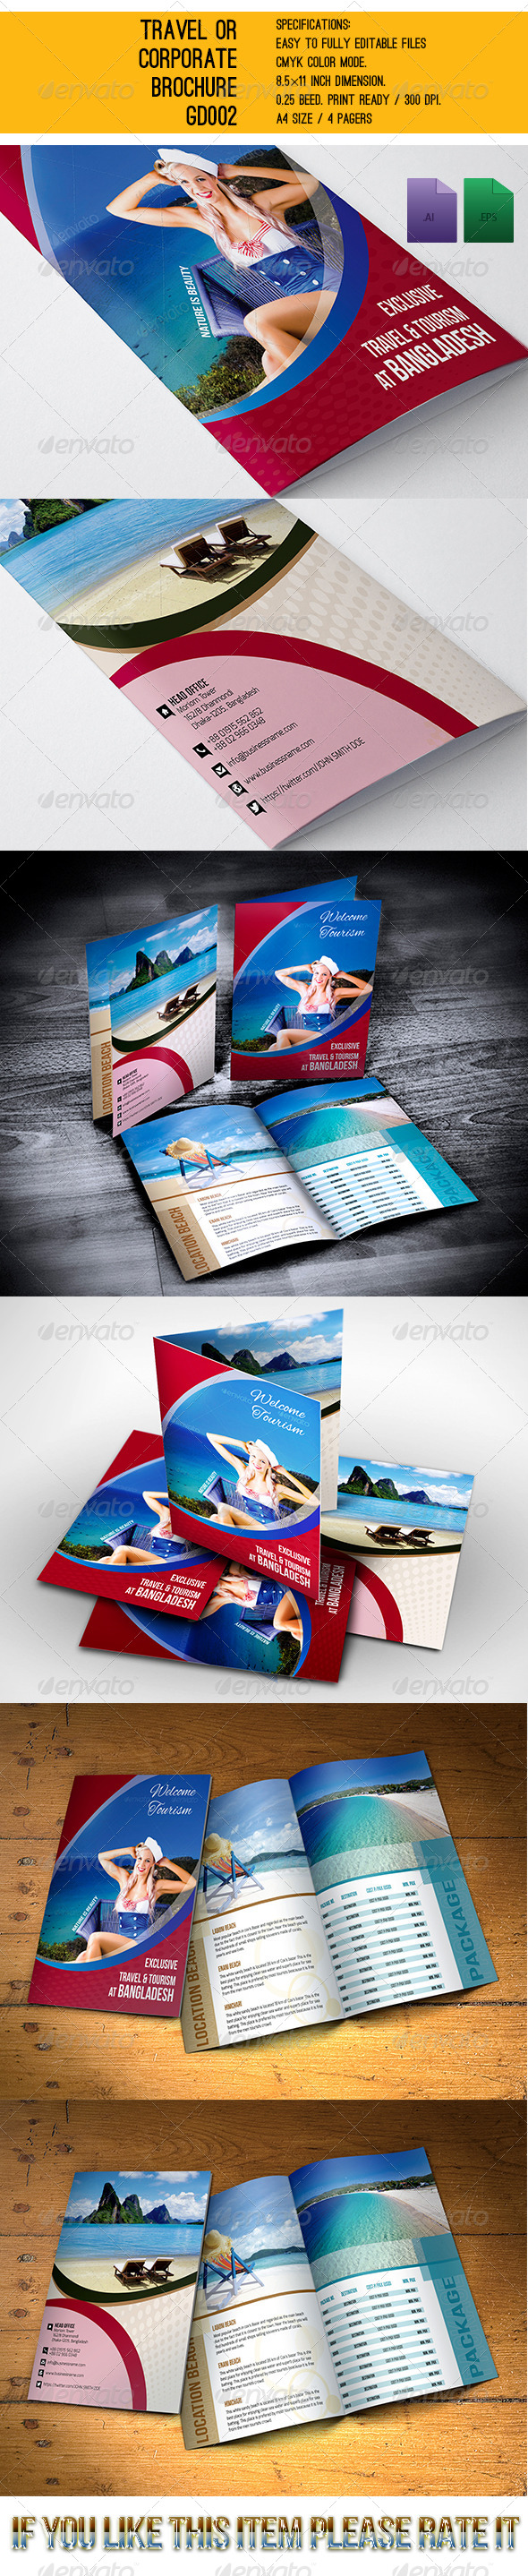 Travel or Corporate Brochures GD003 - Corporate Brochures